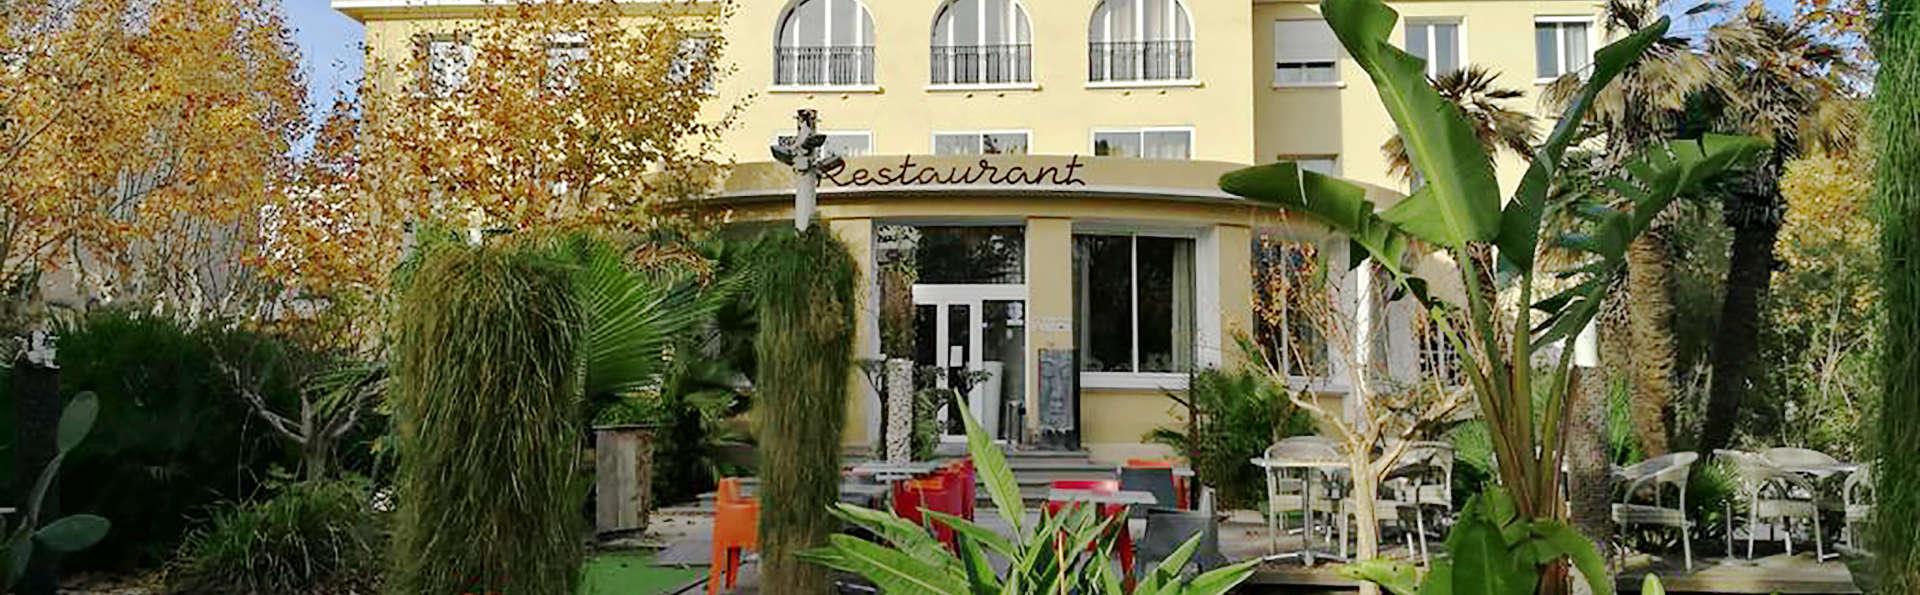 Adonis Sanary Grand Hotel des Bains - EDIT_1_fachada.jpg